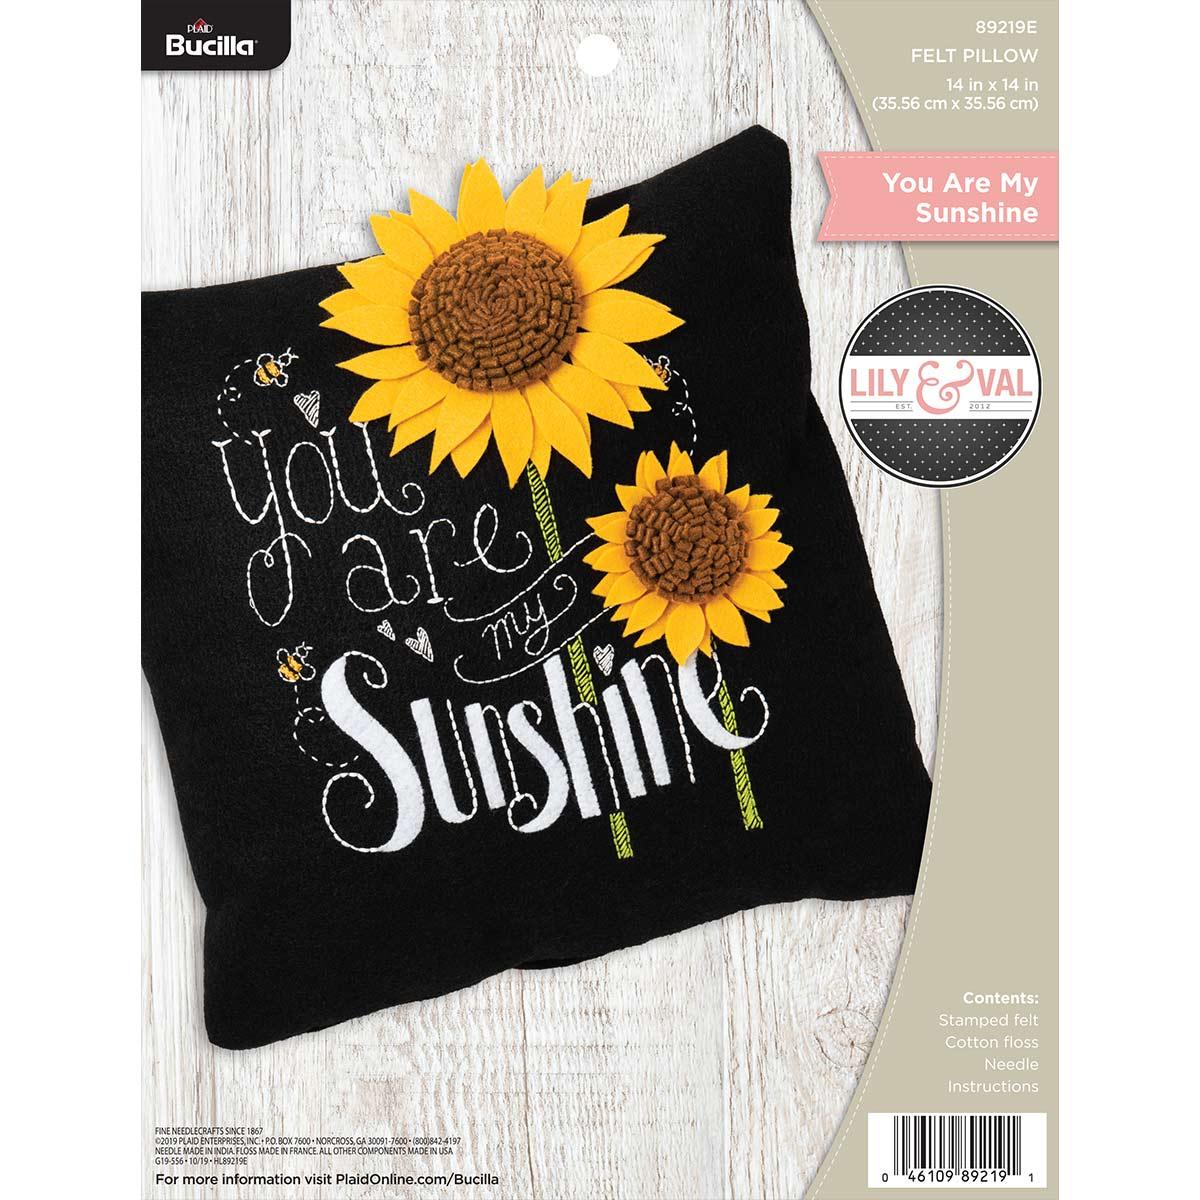 Bucilla ® Lily & Val™ Felt - Home Decor - You Are My Sunshine Pillow - 89219E